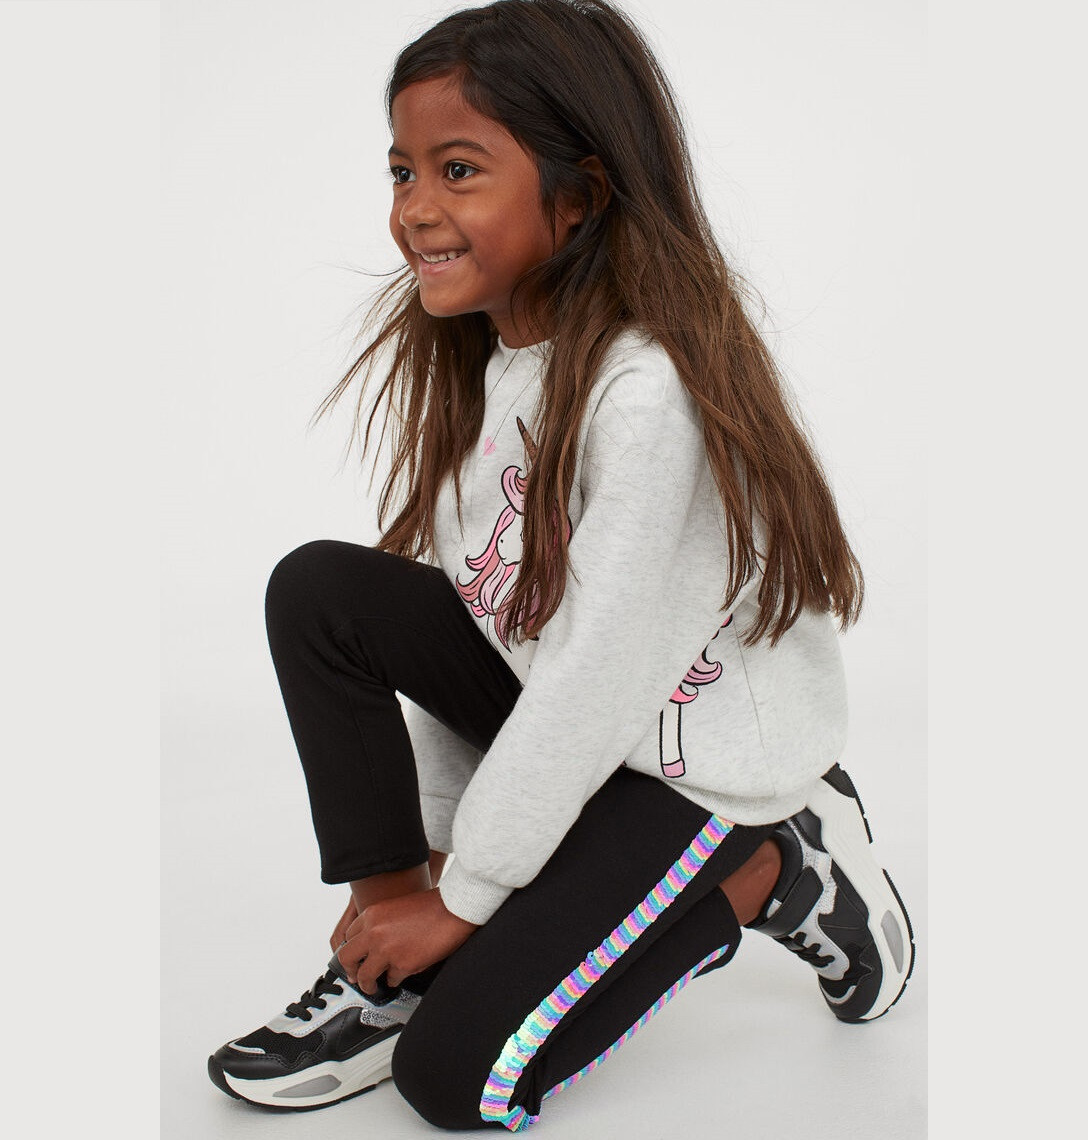 Купити Легінси H&M Side-panel Leggings: Black/Sequins - фото 1